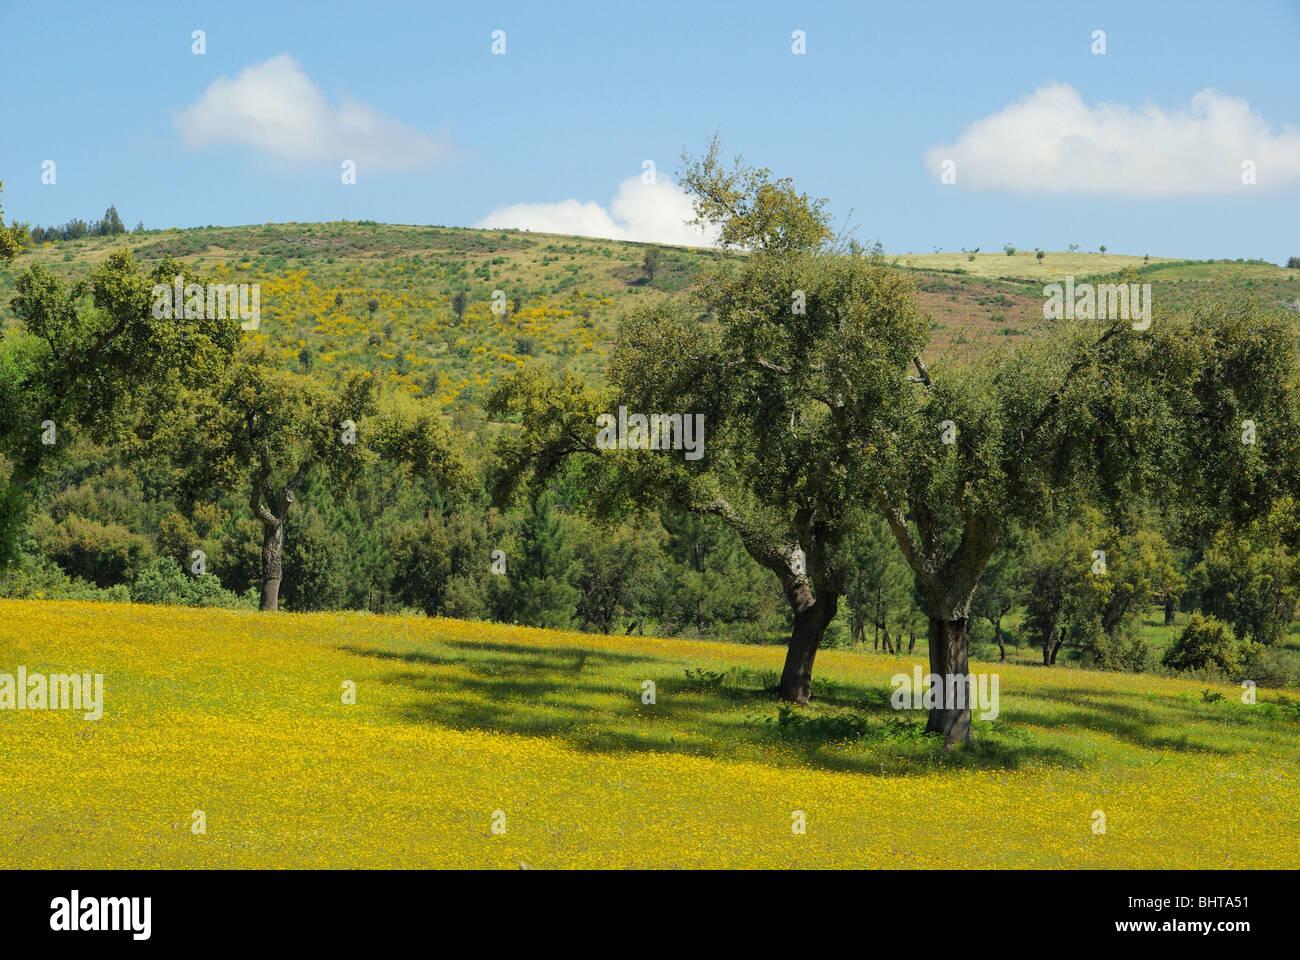 Wiese mit Korkeichen - meadow and cork oaks 03 - Stock Image